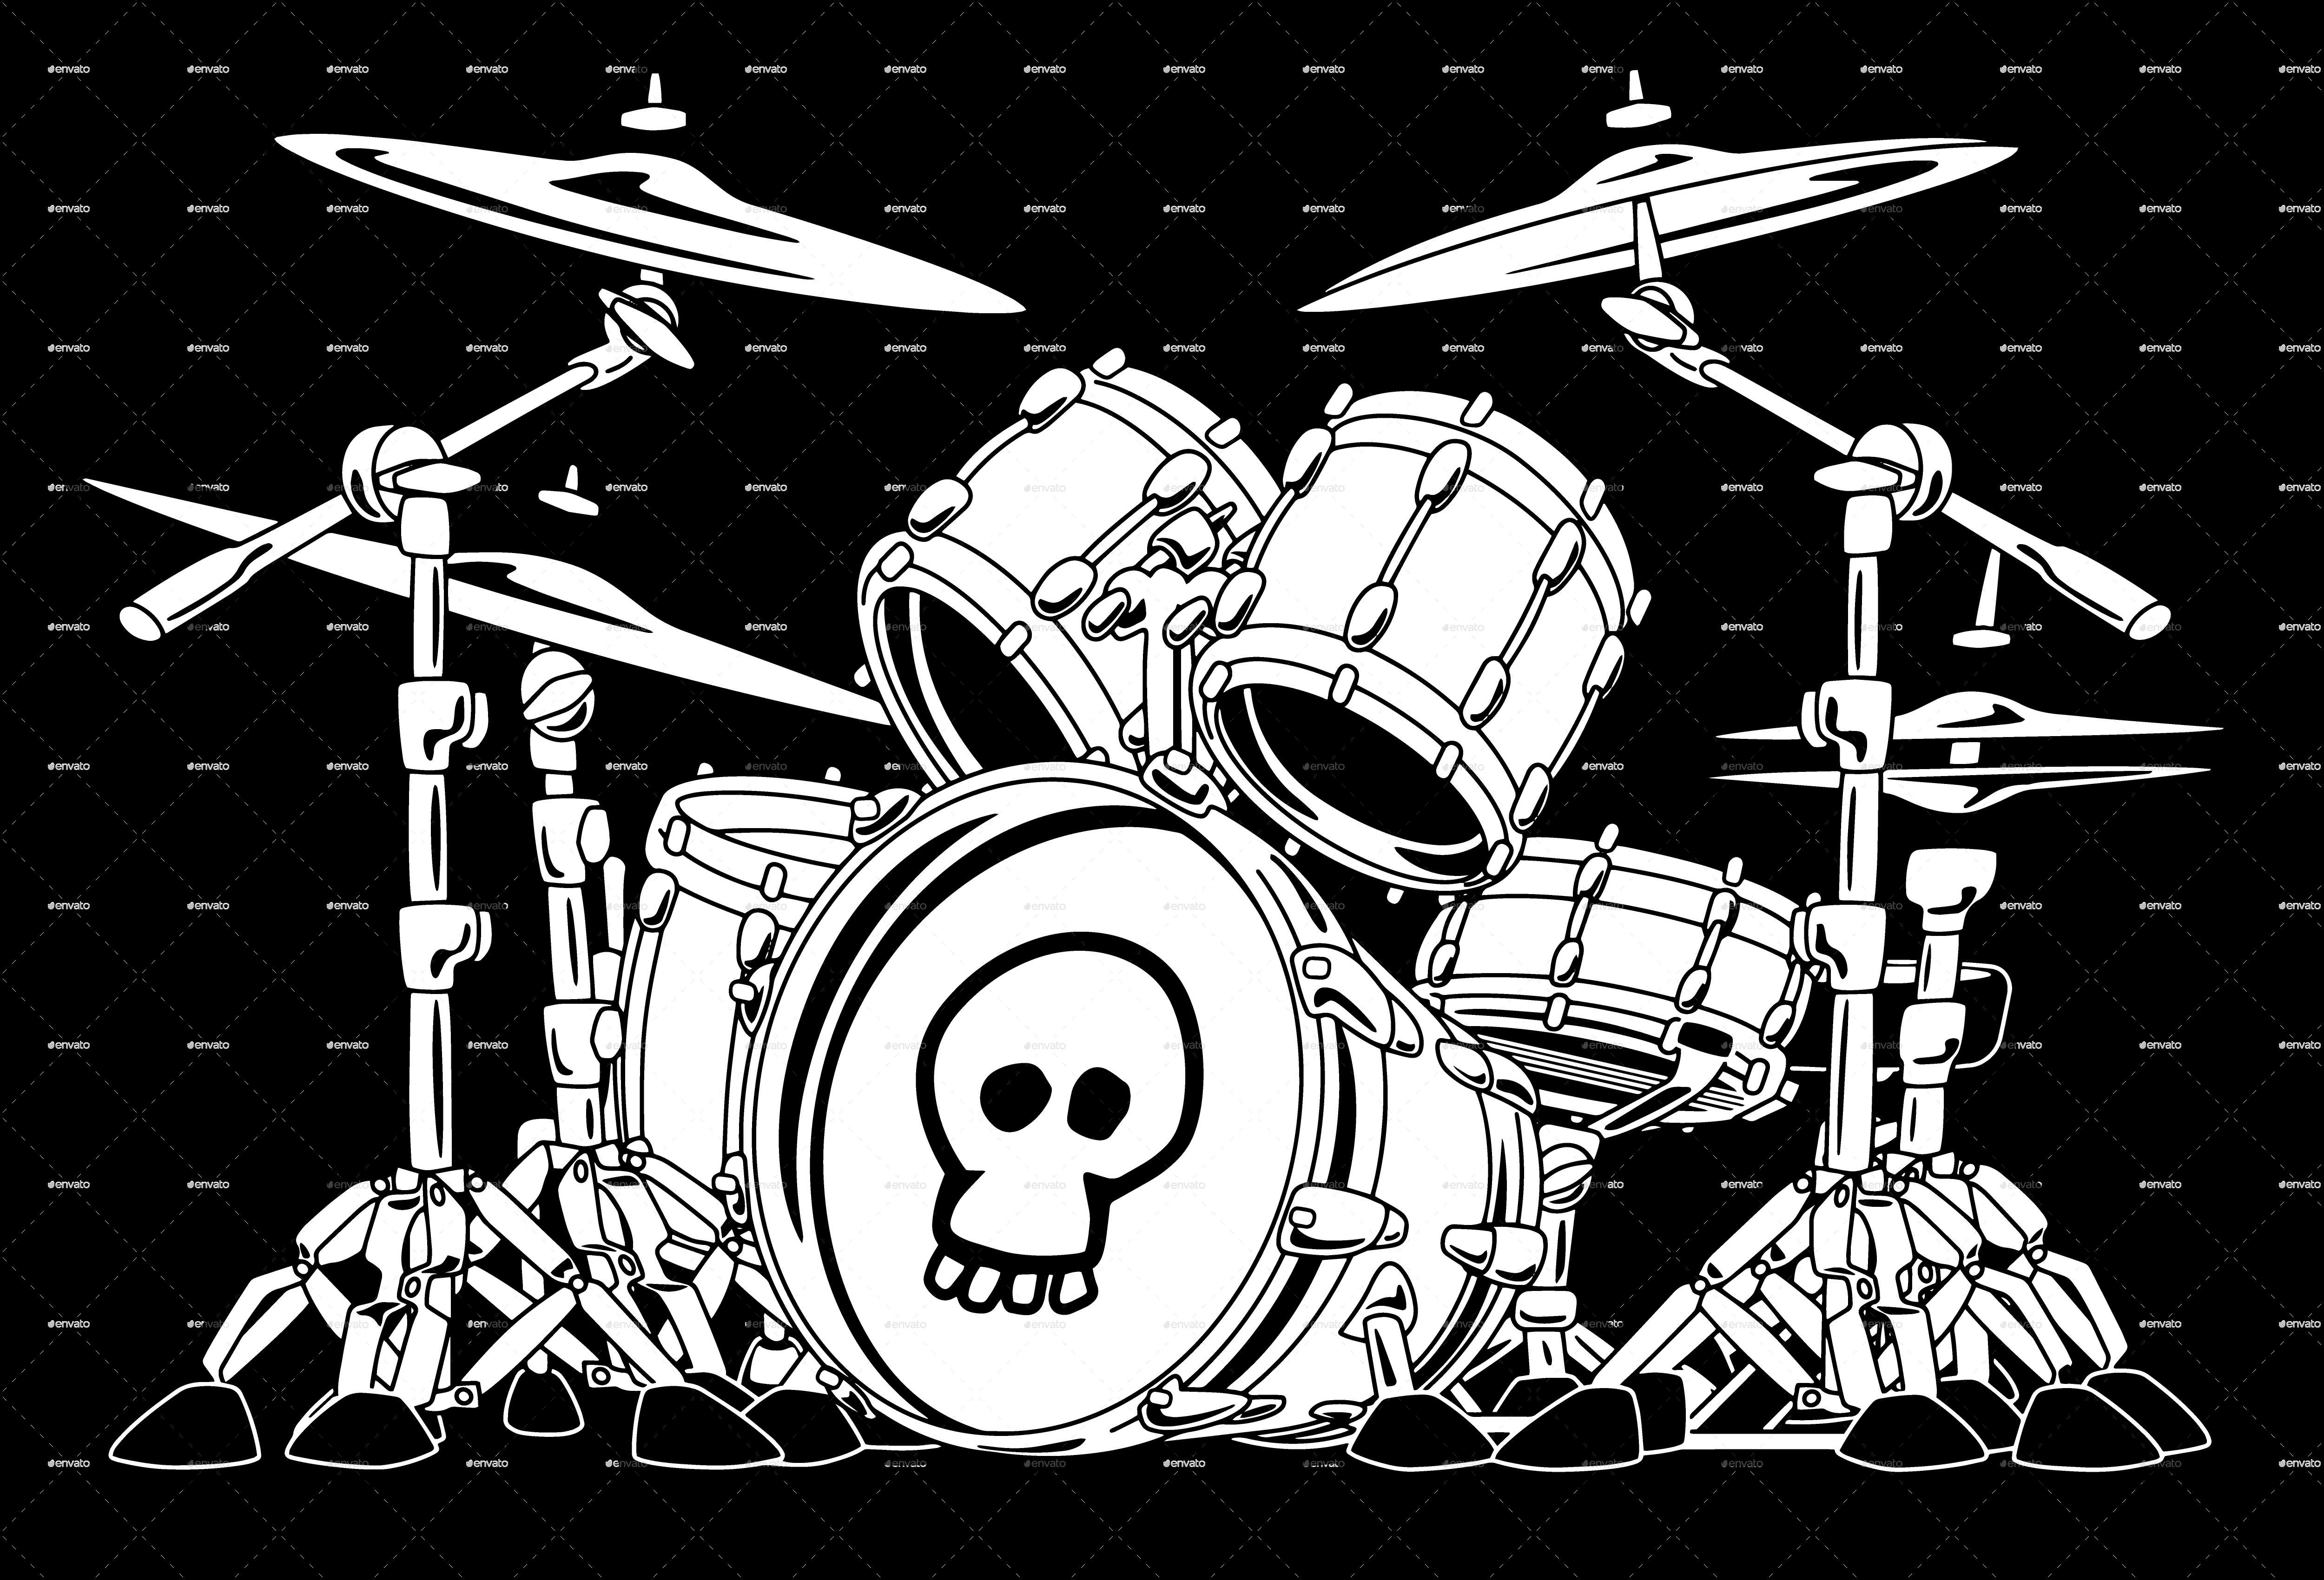 Rock Drum Set Cartoon Vector Illustration 드럼, 패턴, 배경